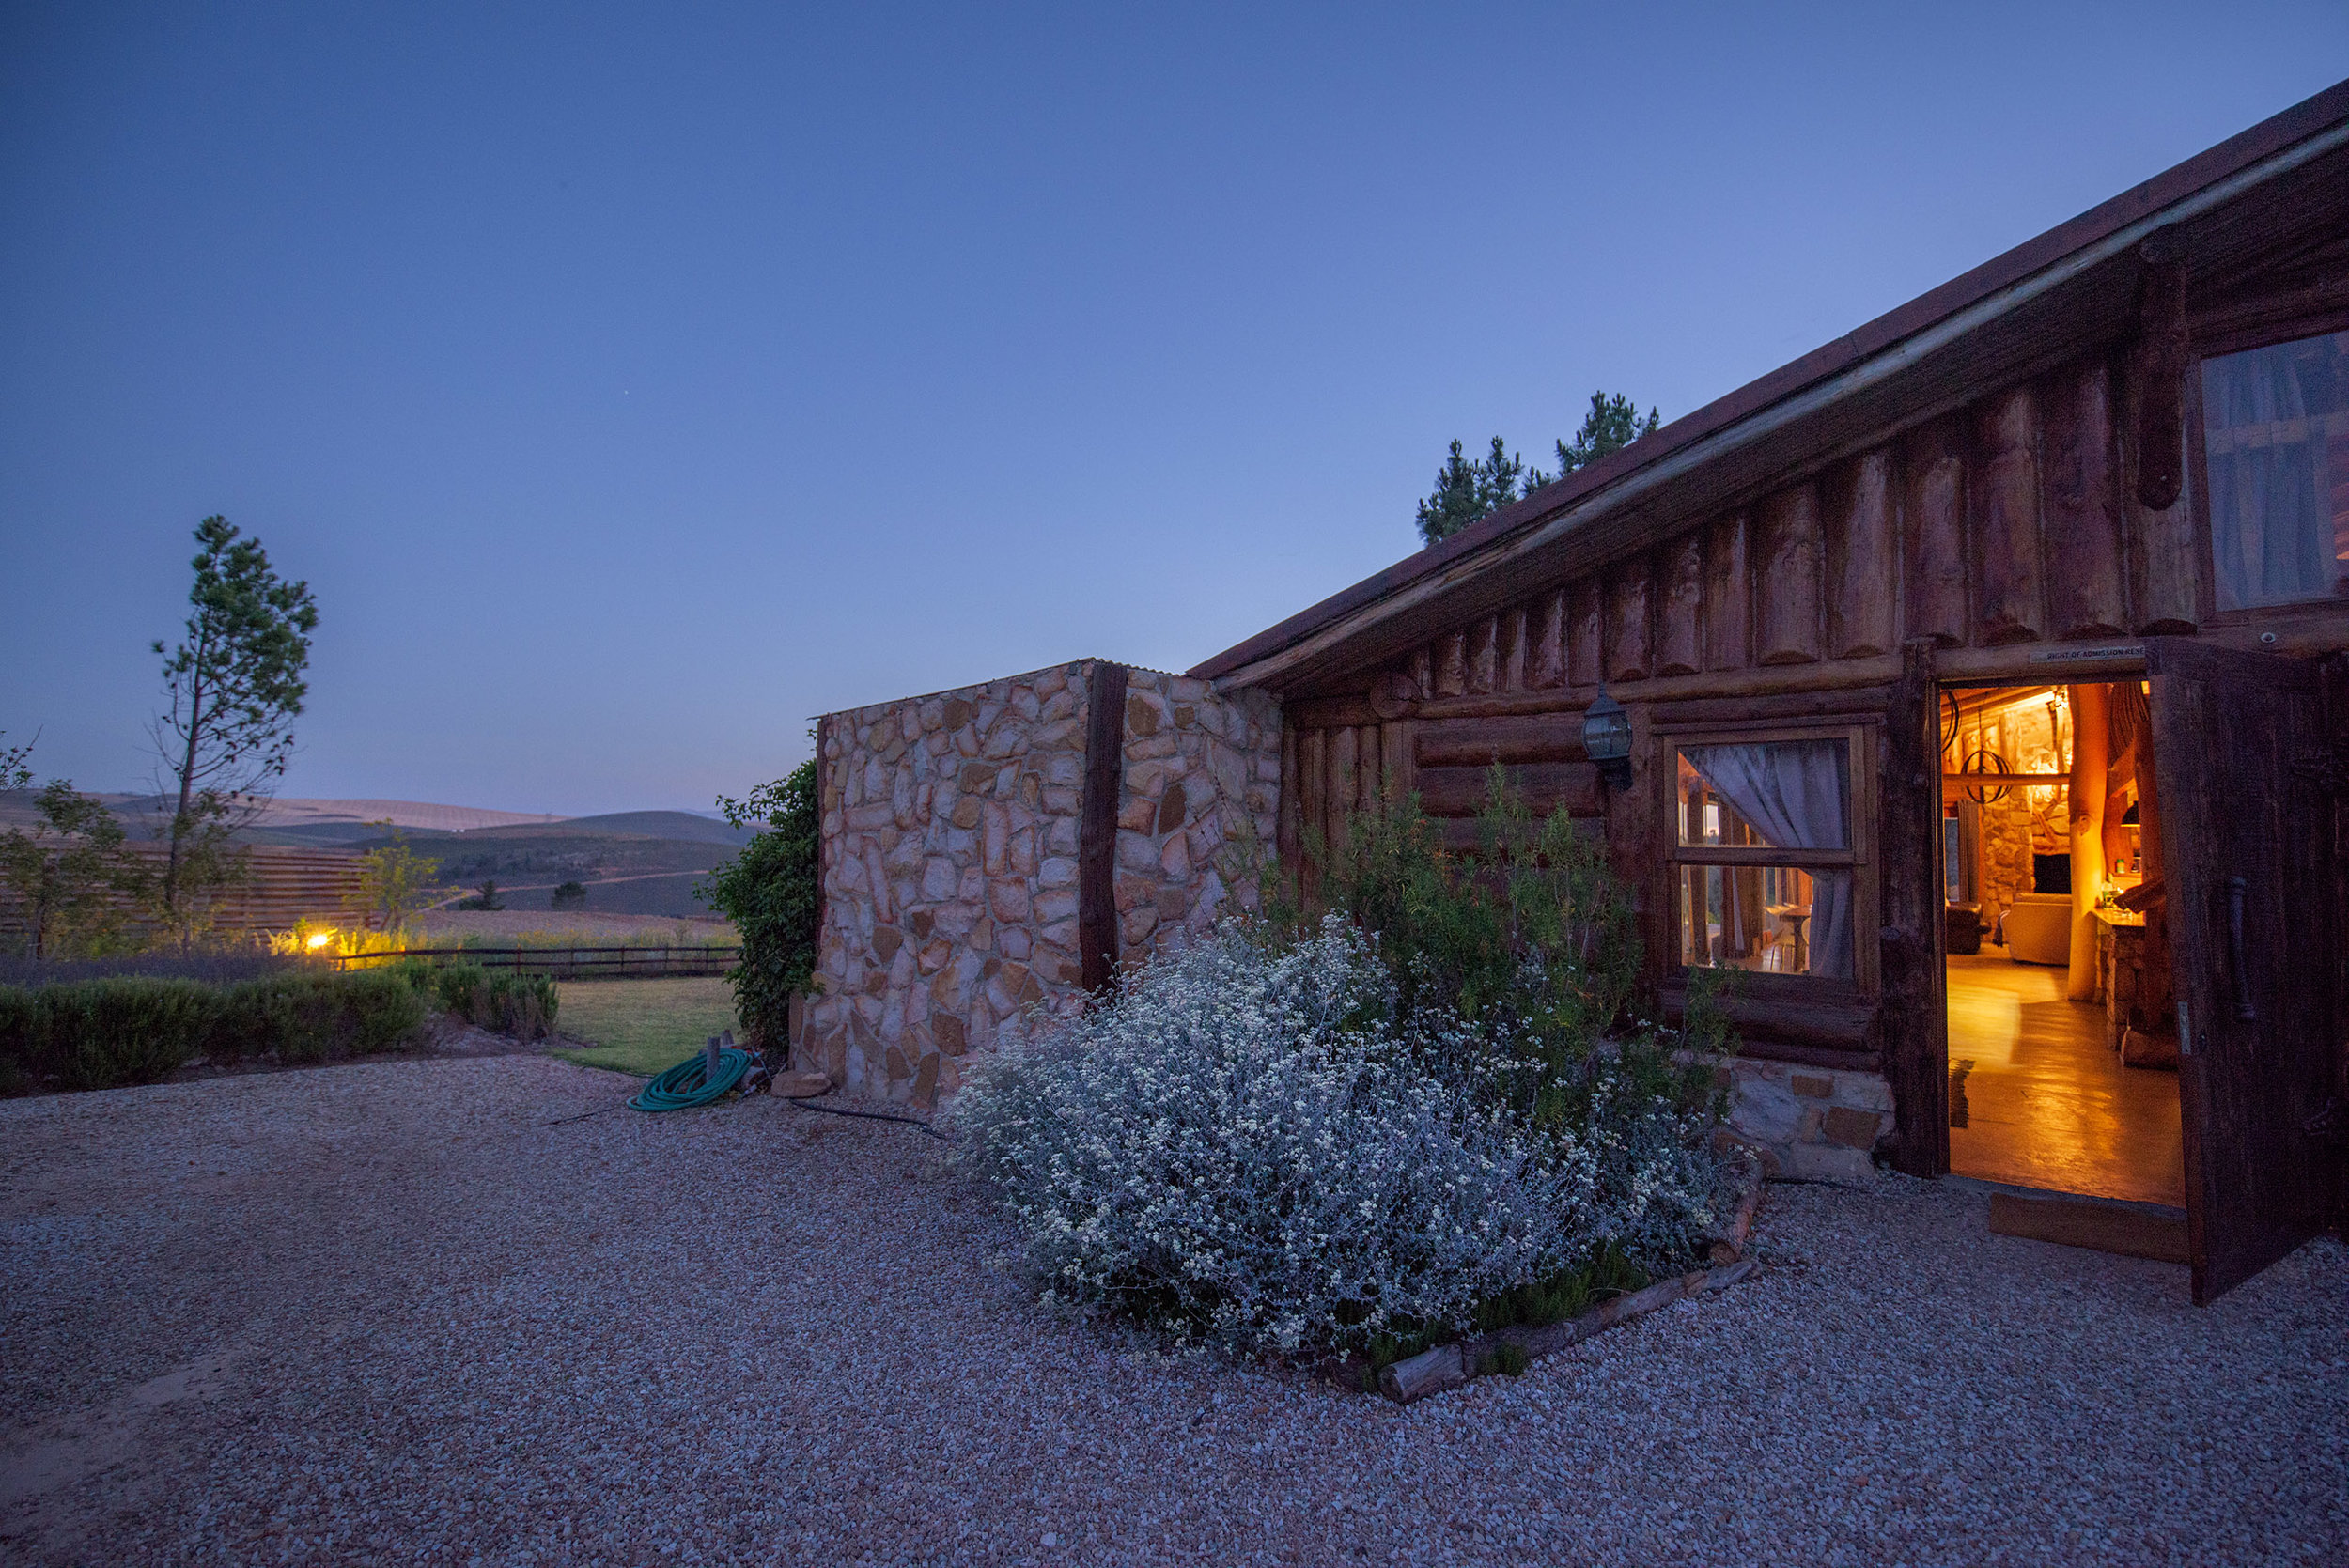 Kolkol Mountain Lodge